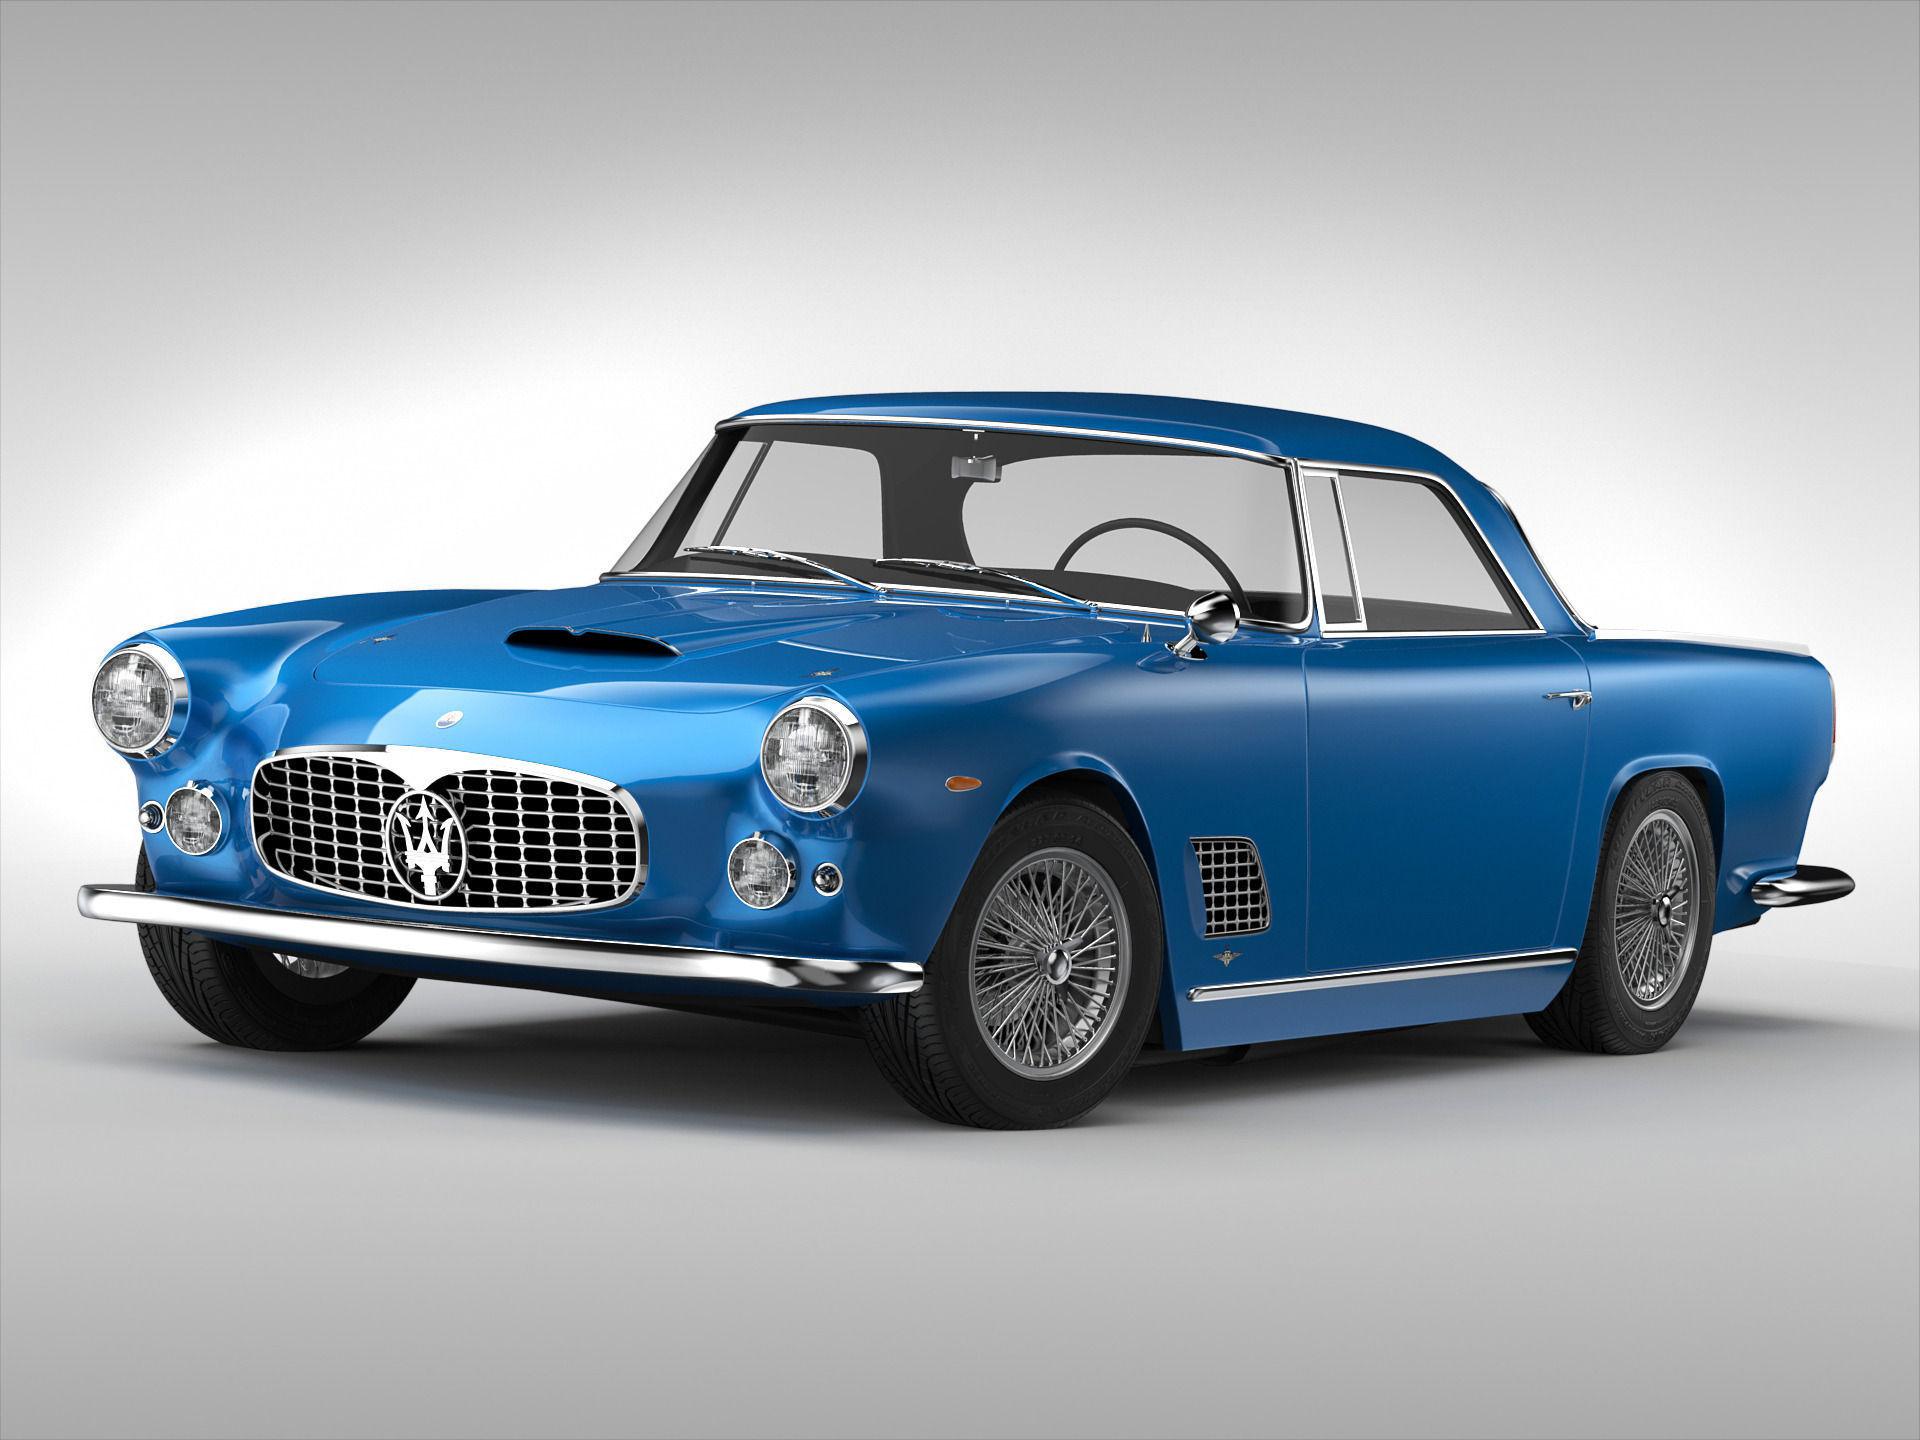 Maserati 3500 Gt 1957 1964 3d Model